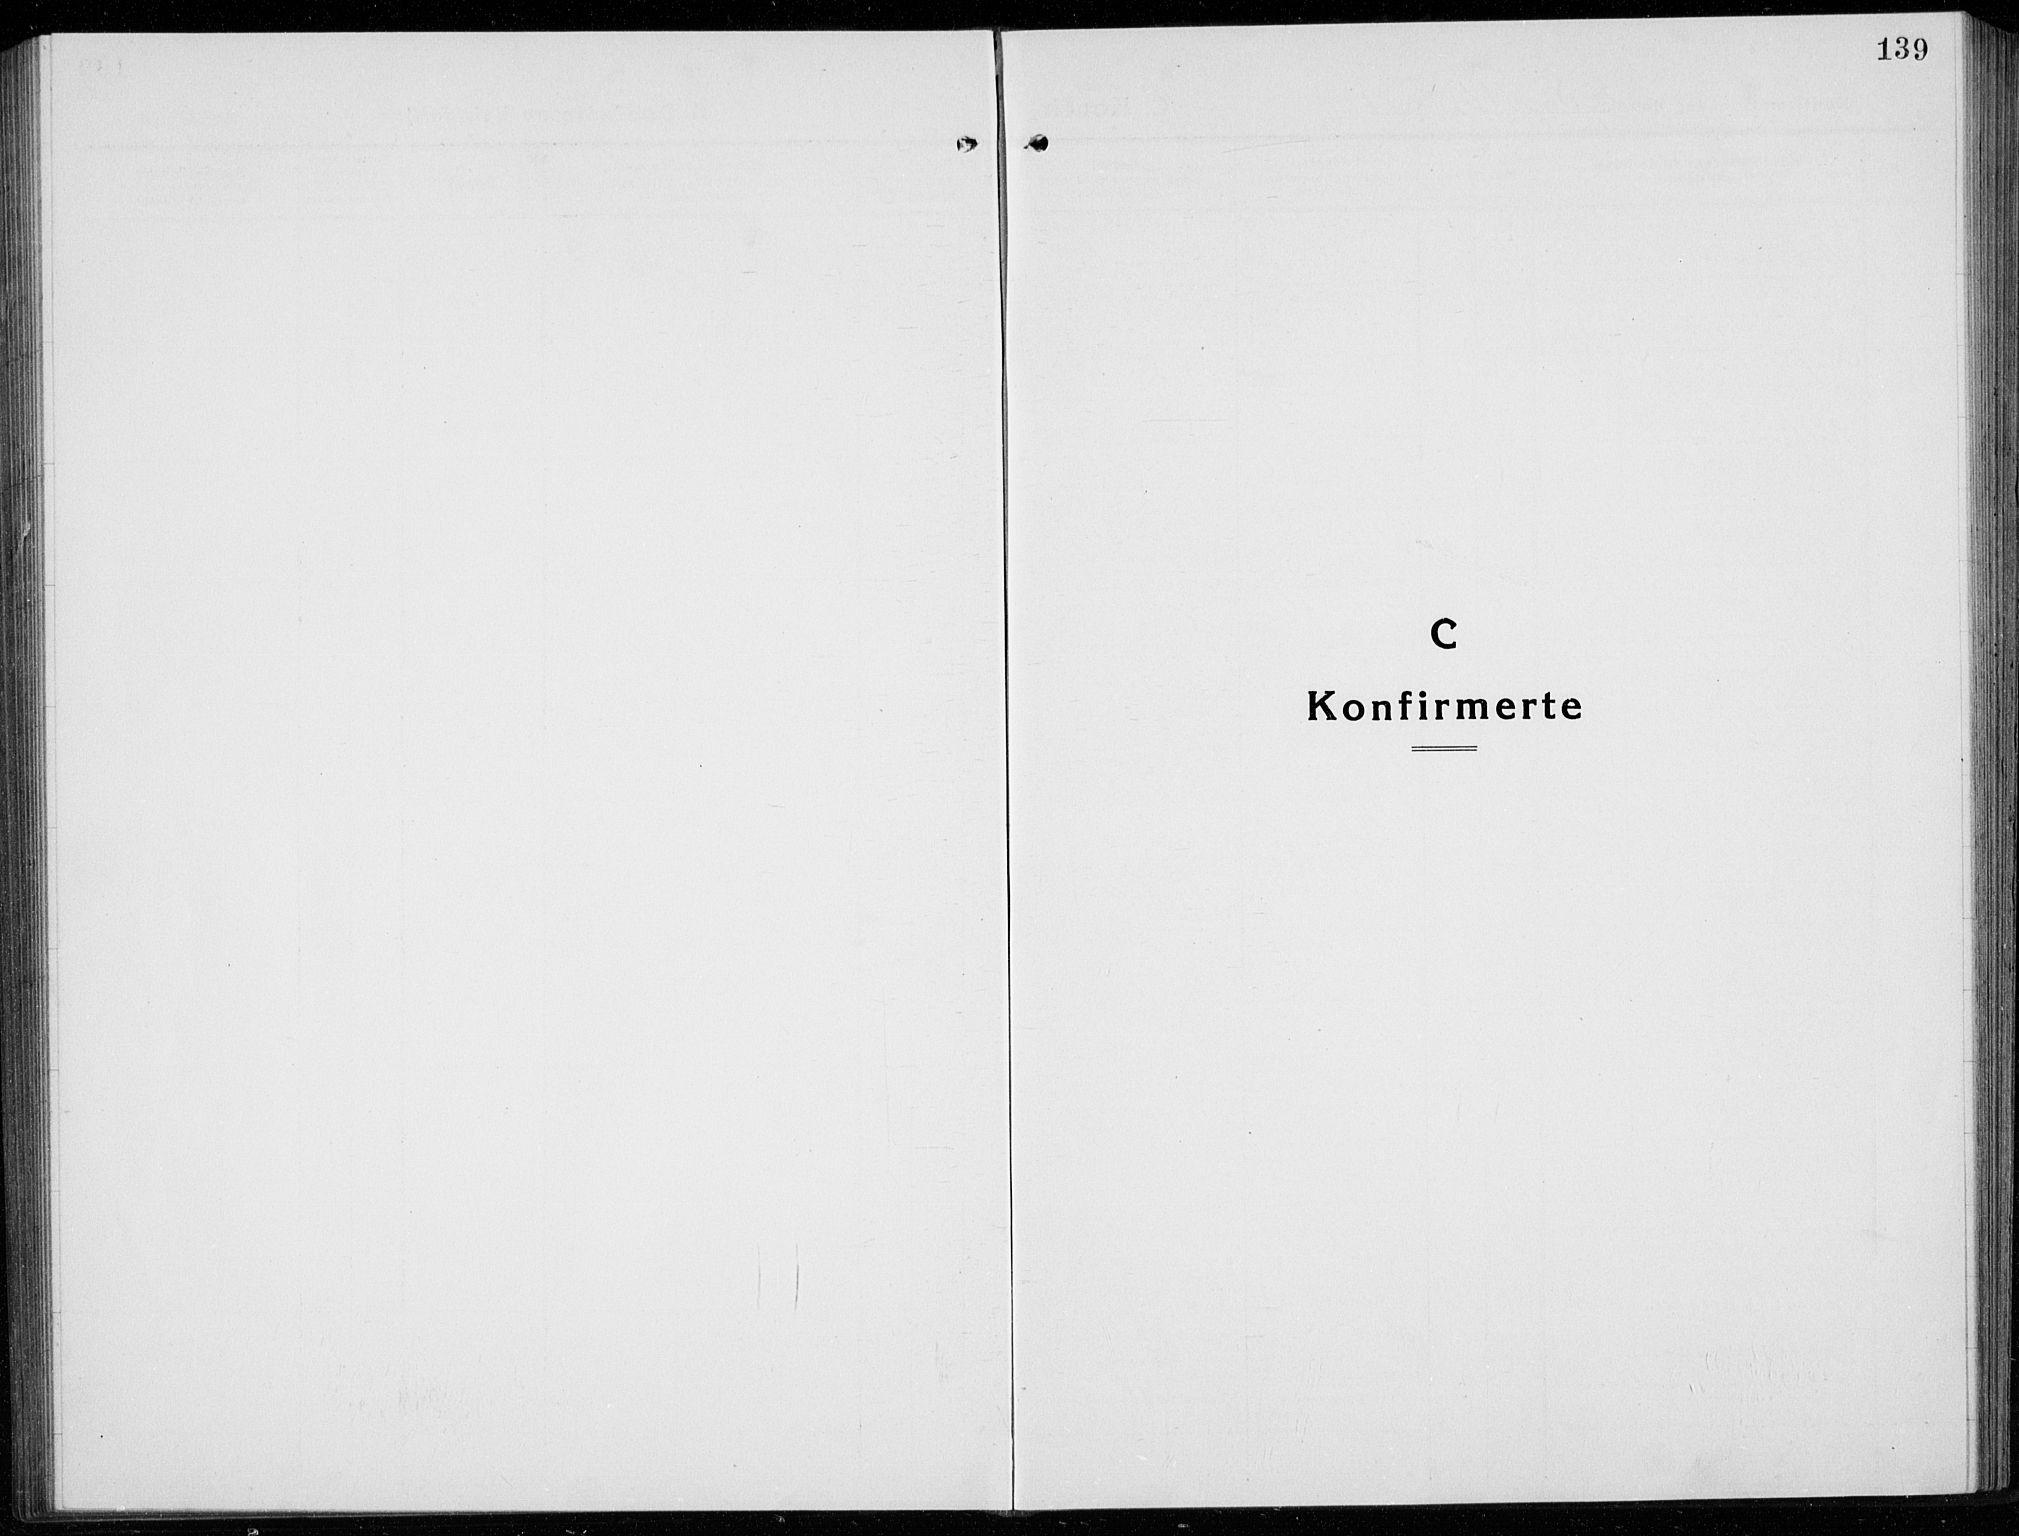 SAKO, Sigdal kirkebøker, G/Ga/L0007: Klokkerbok nr. I 7, 1917-1935, s. 139